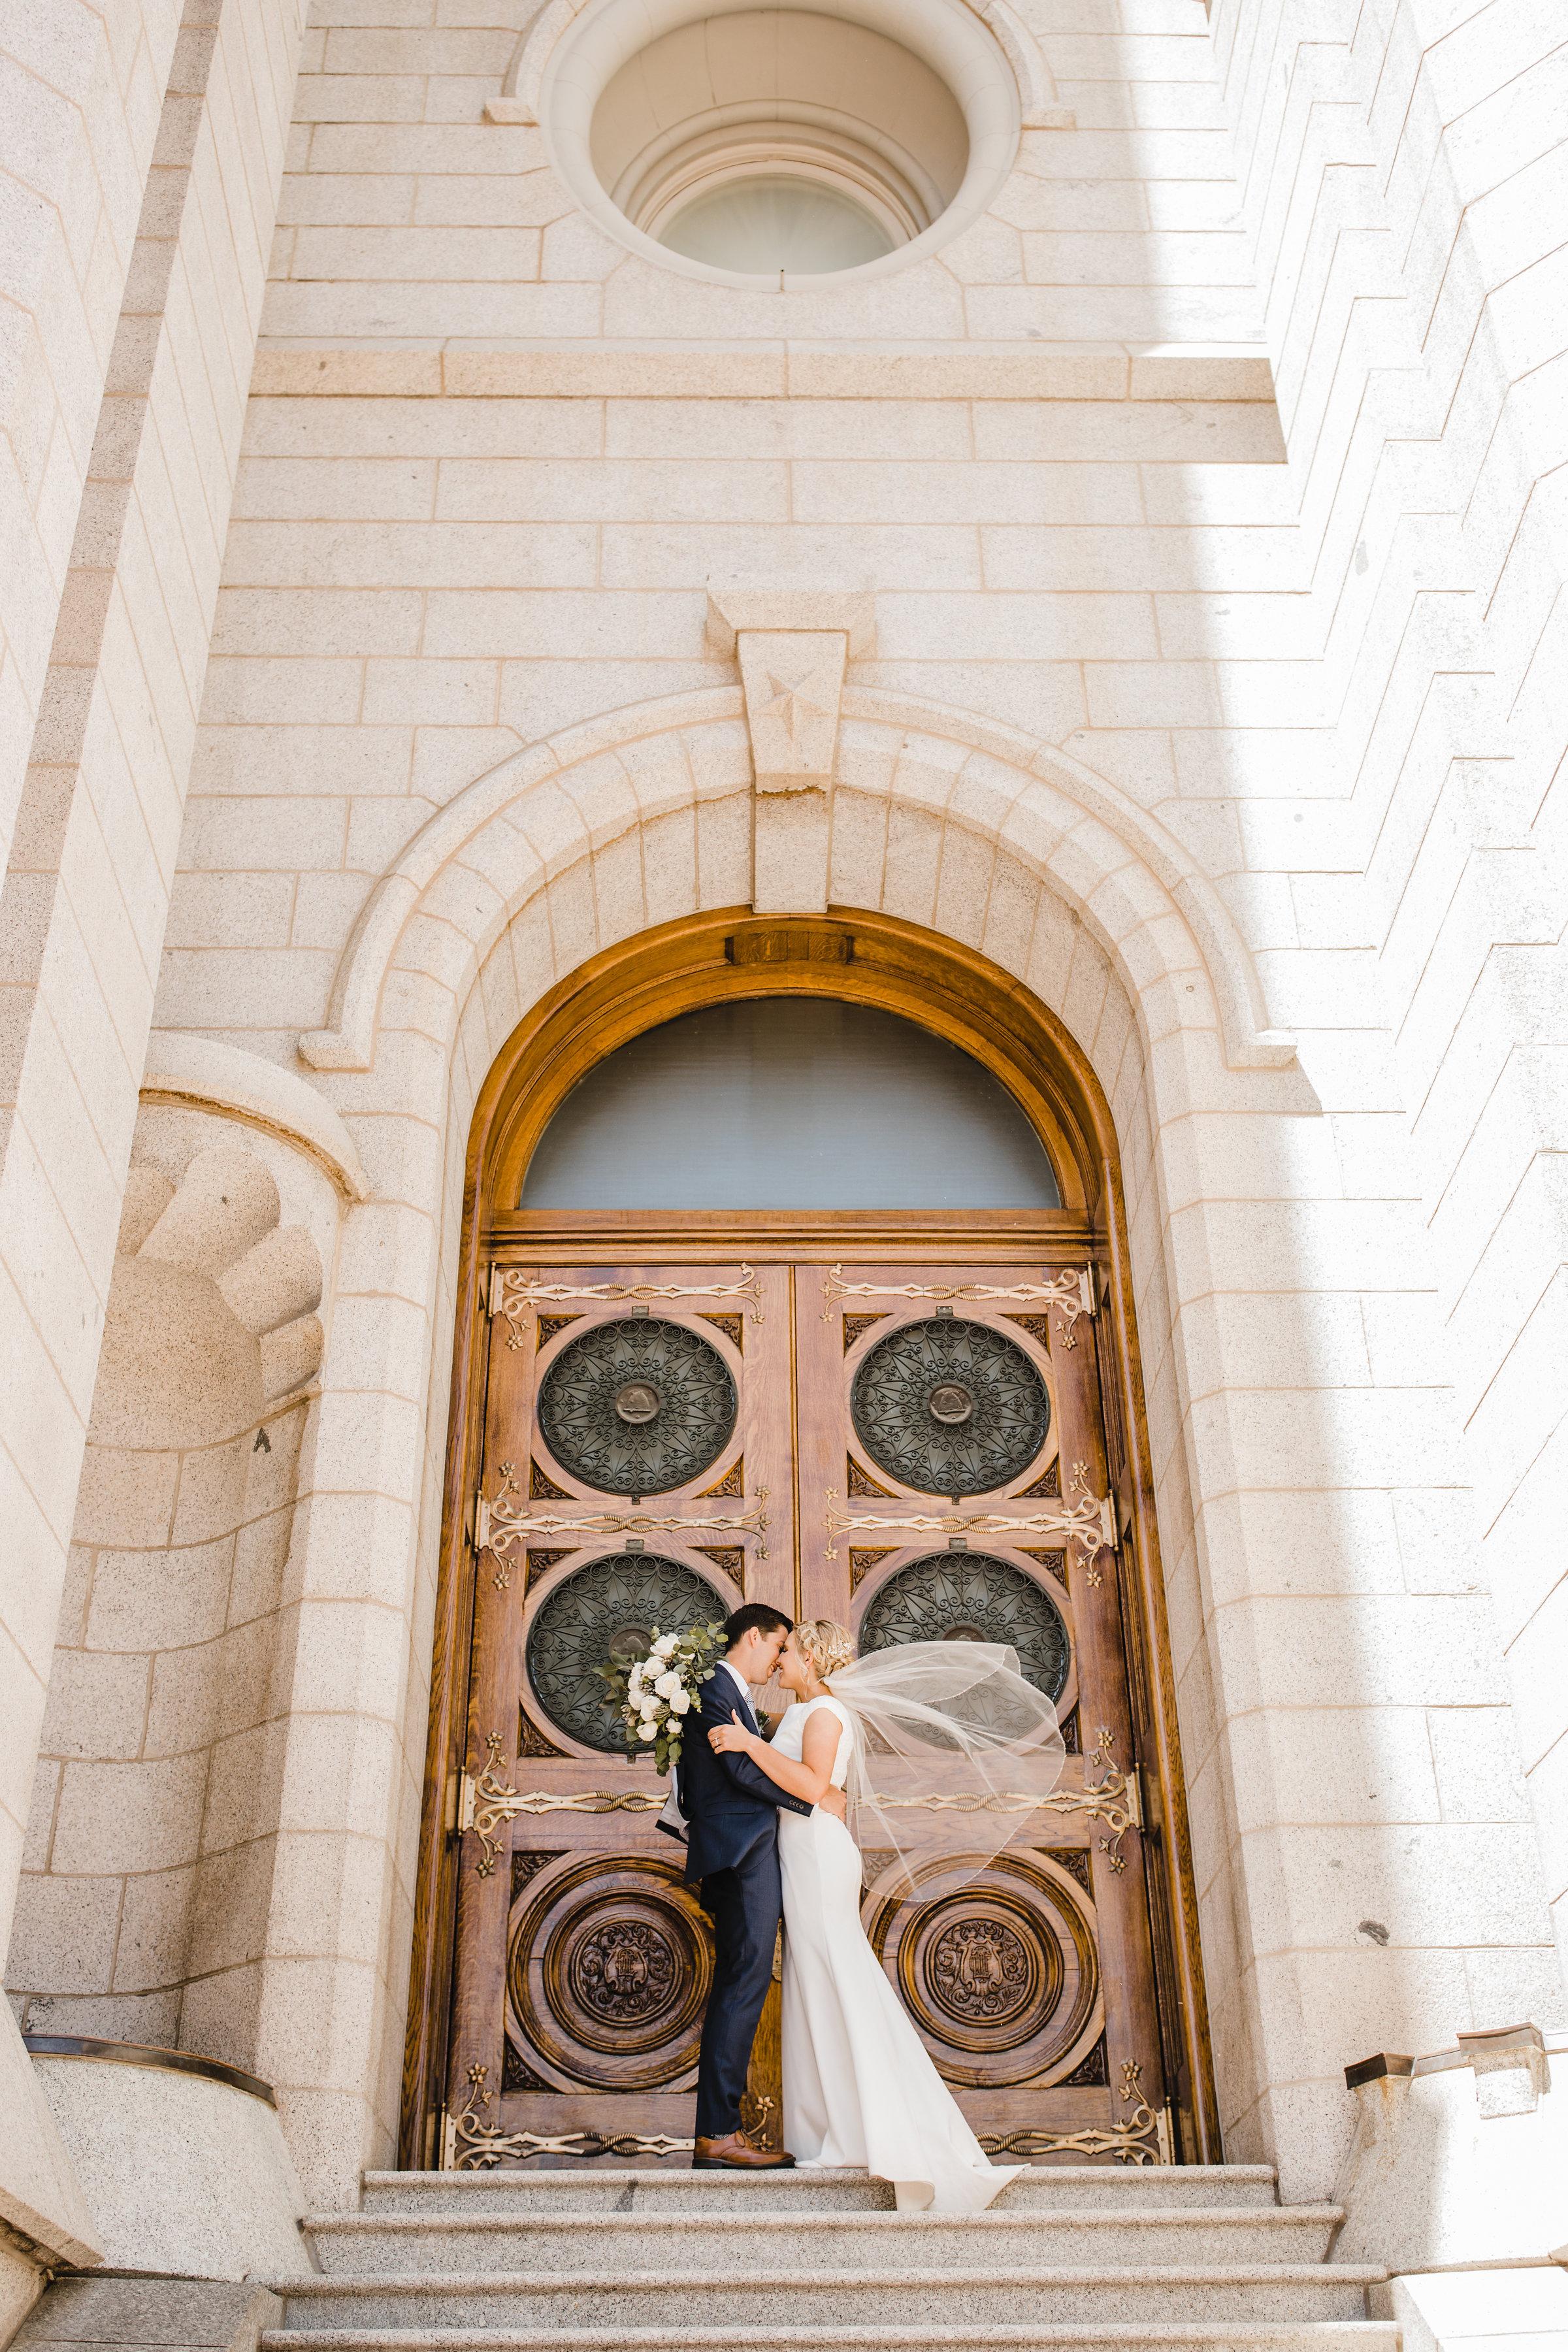 professional wedding photographer salt lake city utah kissing lds temple